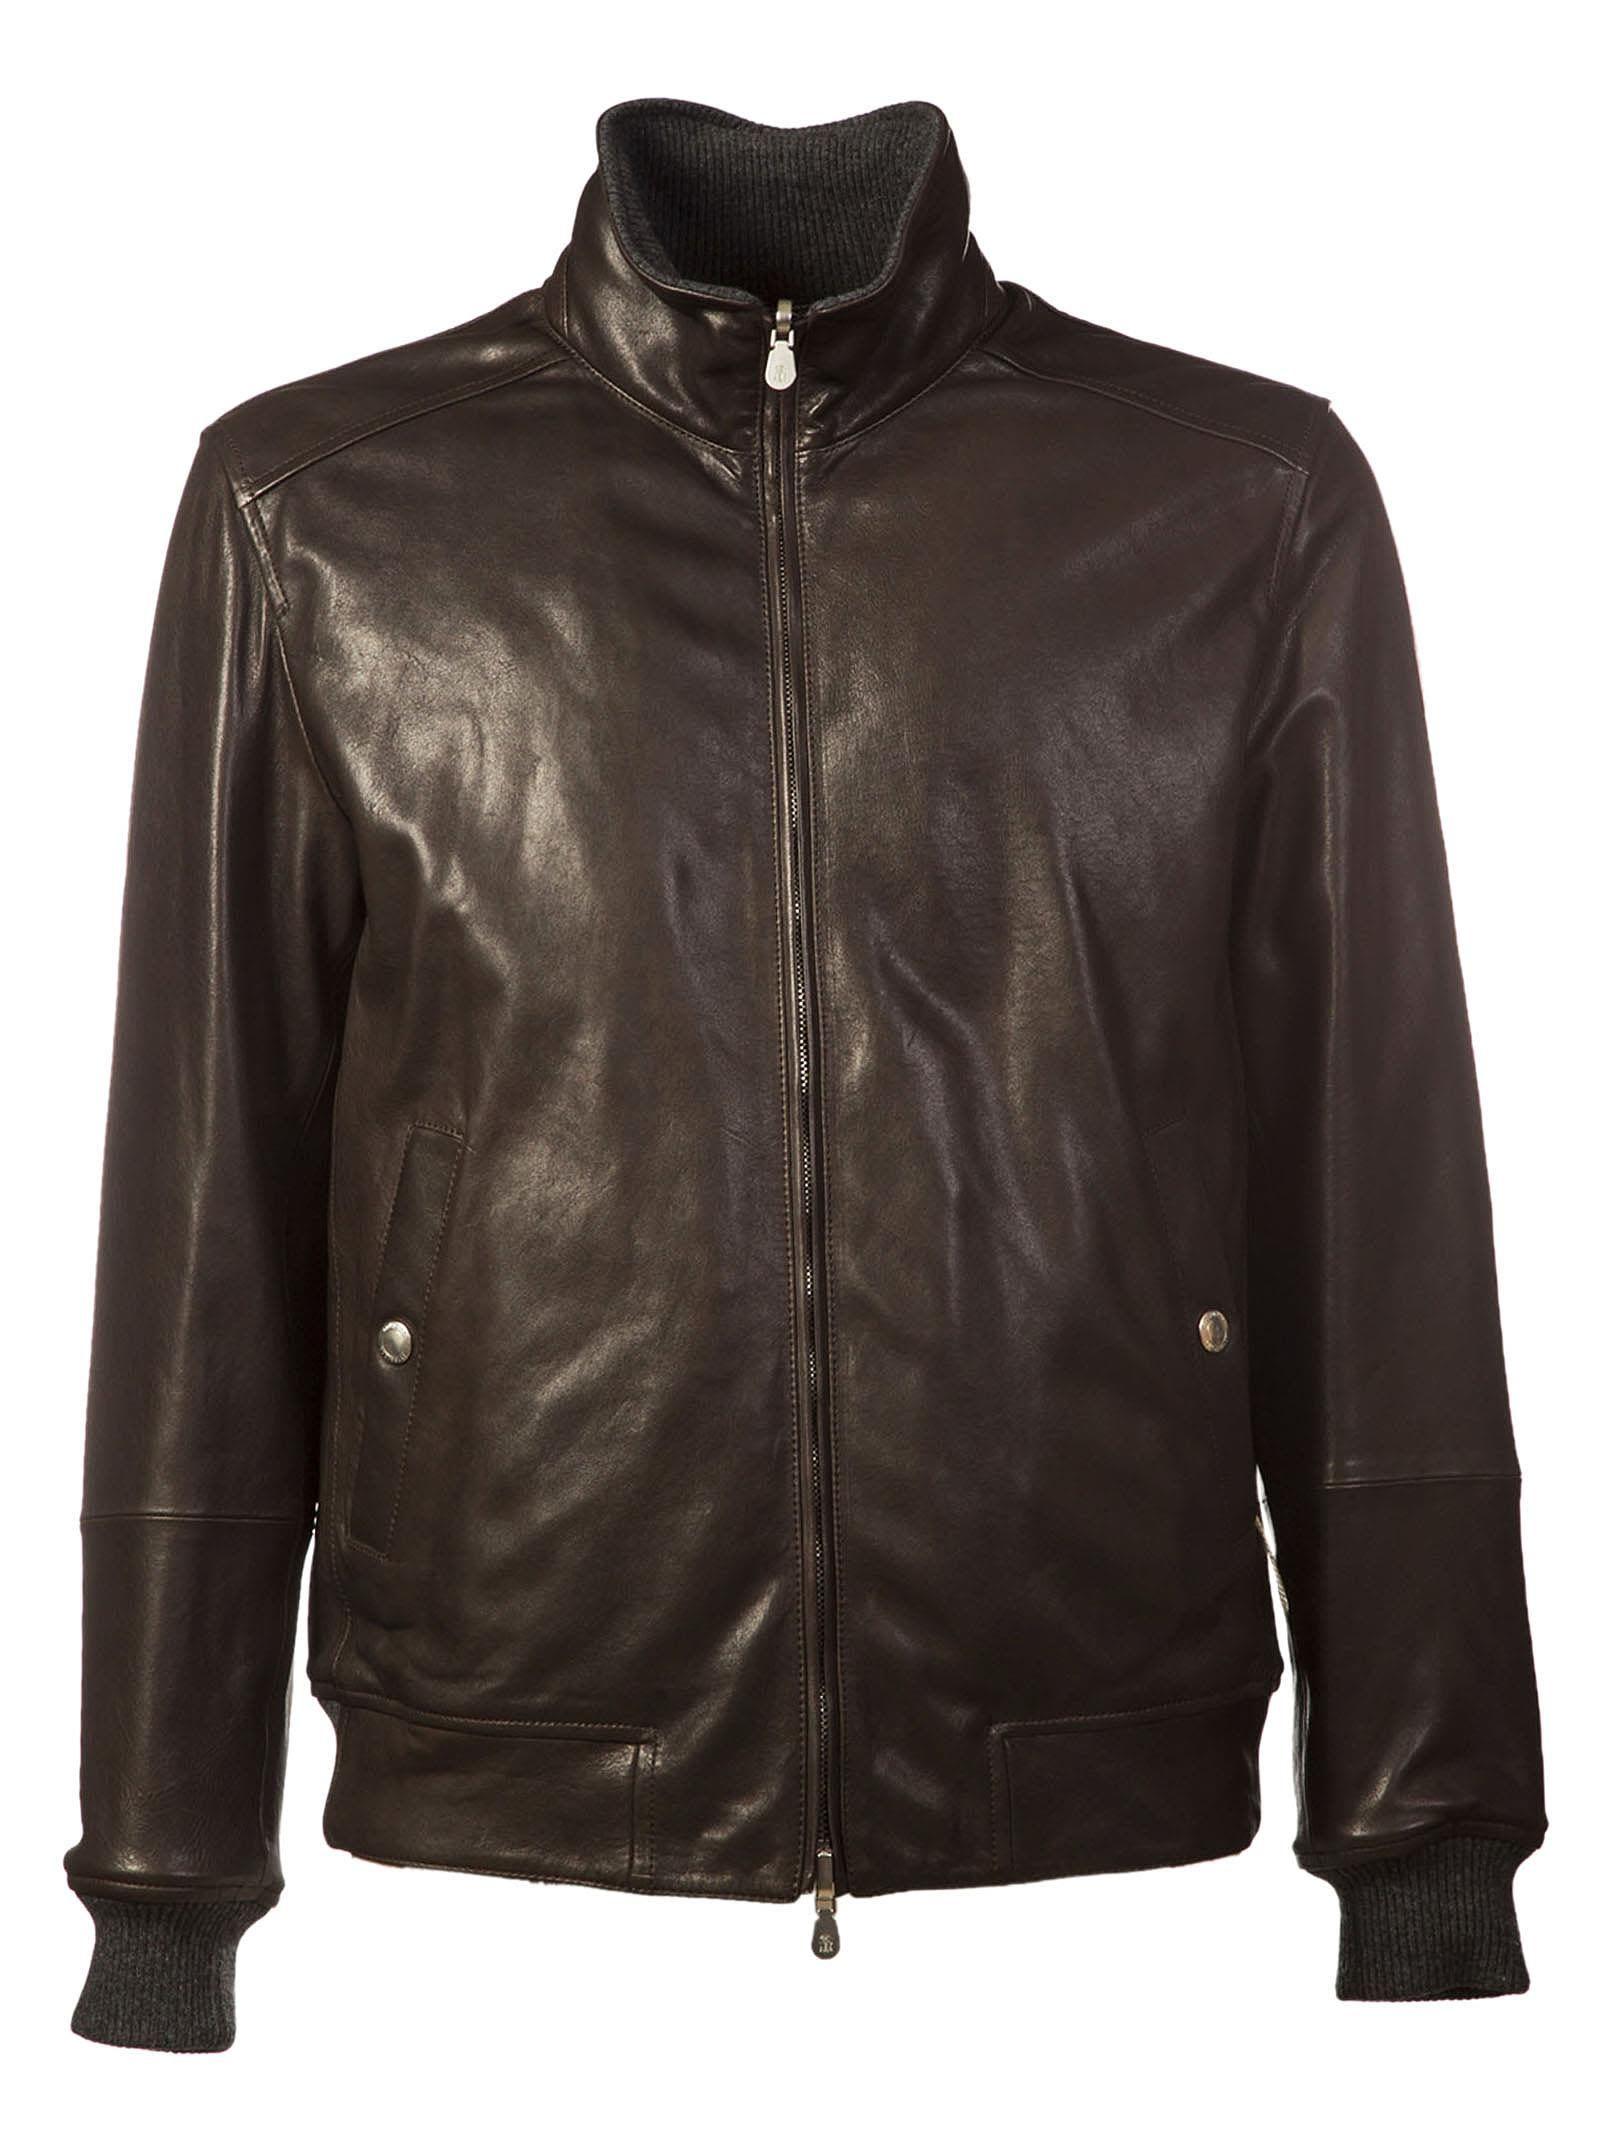 Brunello Cucinelli Reversible Leather Jacket Brunellocucinelli Cloth Leather Jacket With Hood Leather Jacket Reversible Leather [ 2136 x 1600 Pixel ]